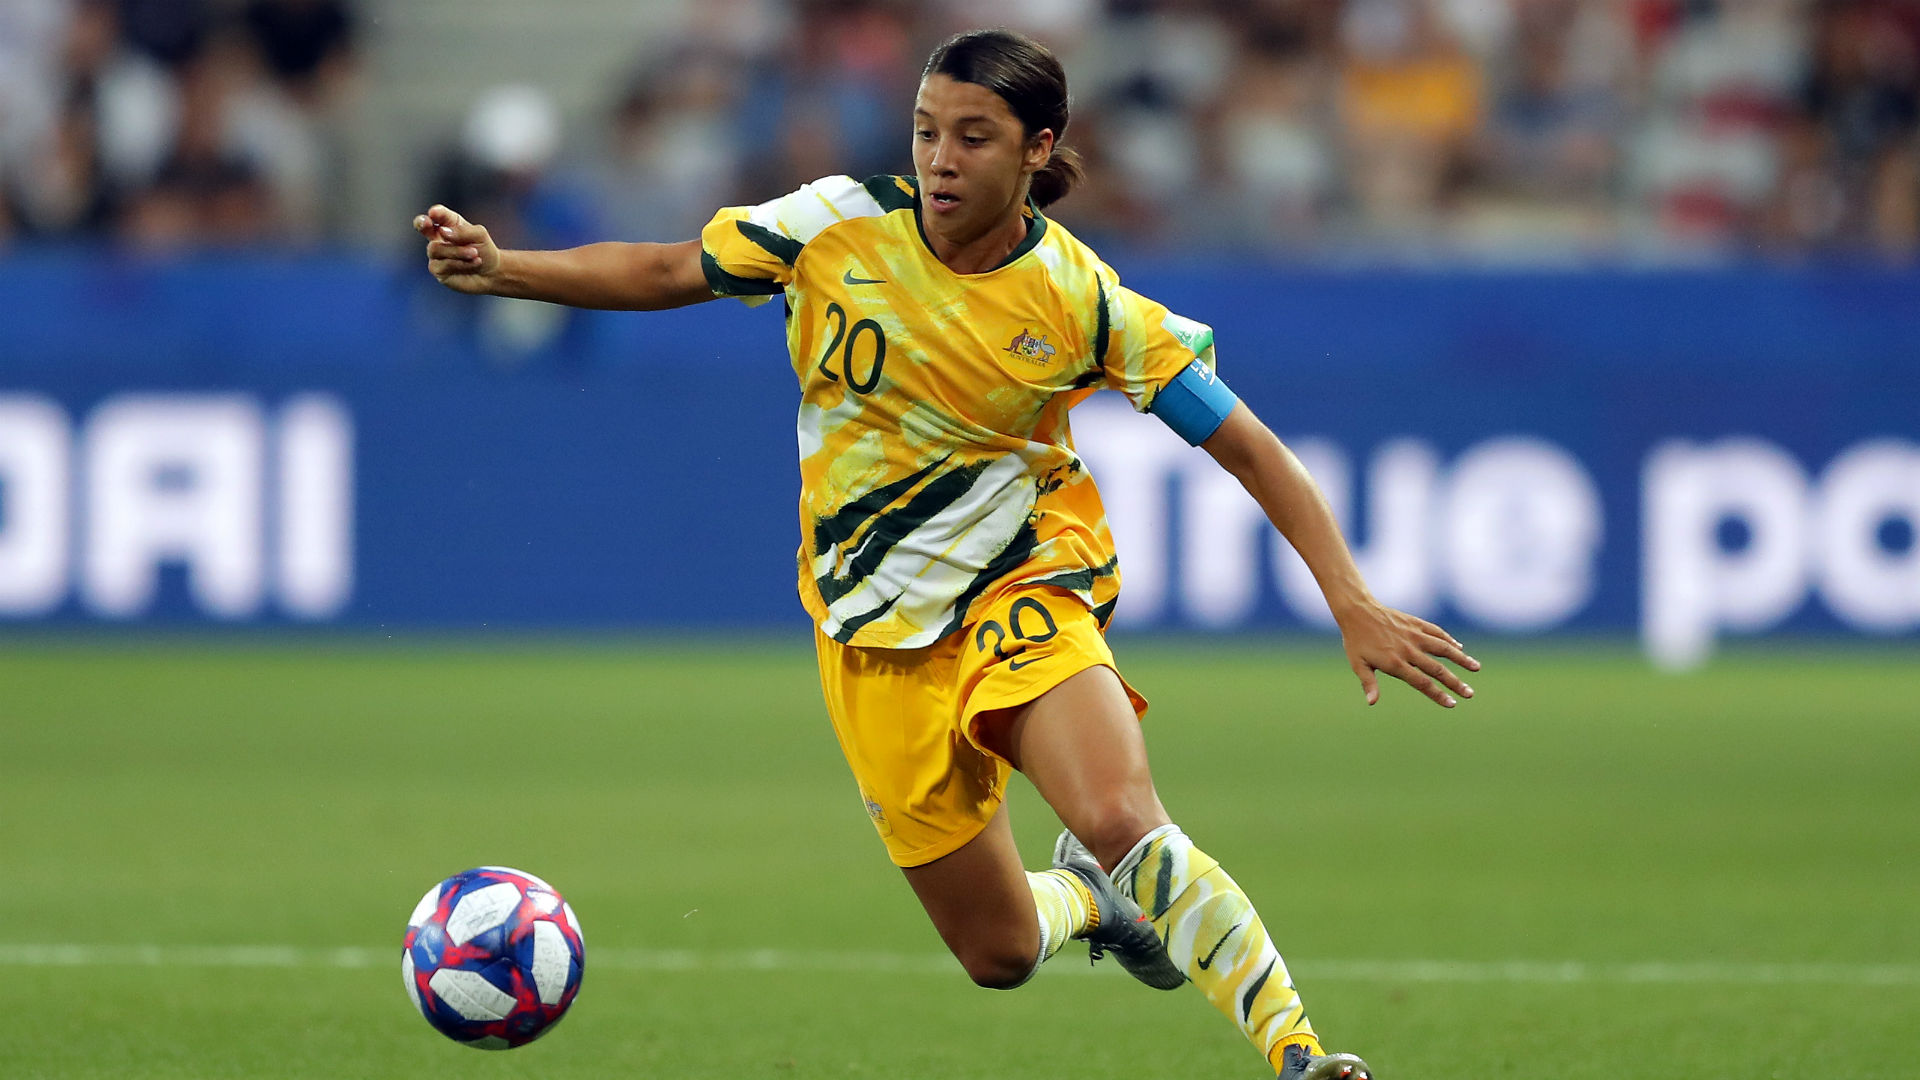 Australia, New Zealand bid to co-host 2023 Women's World Cup